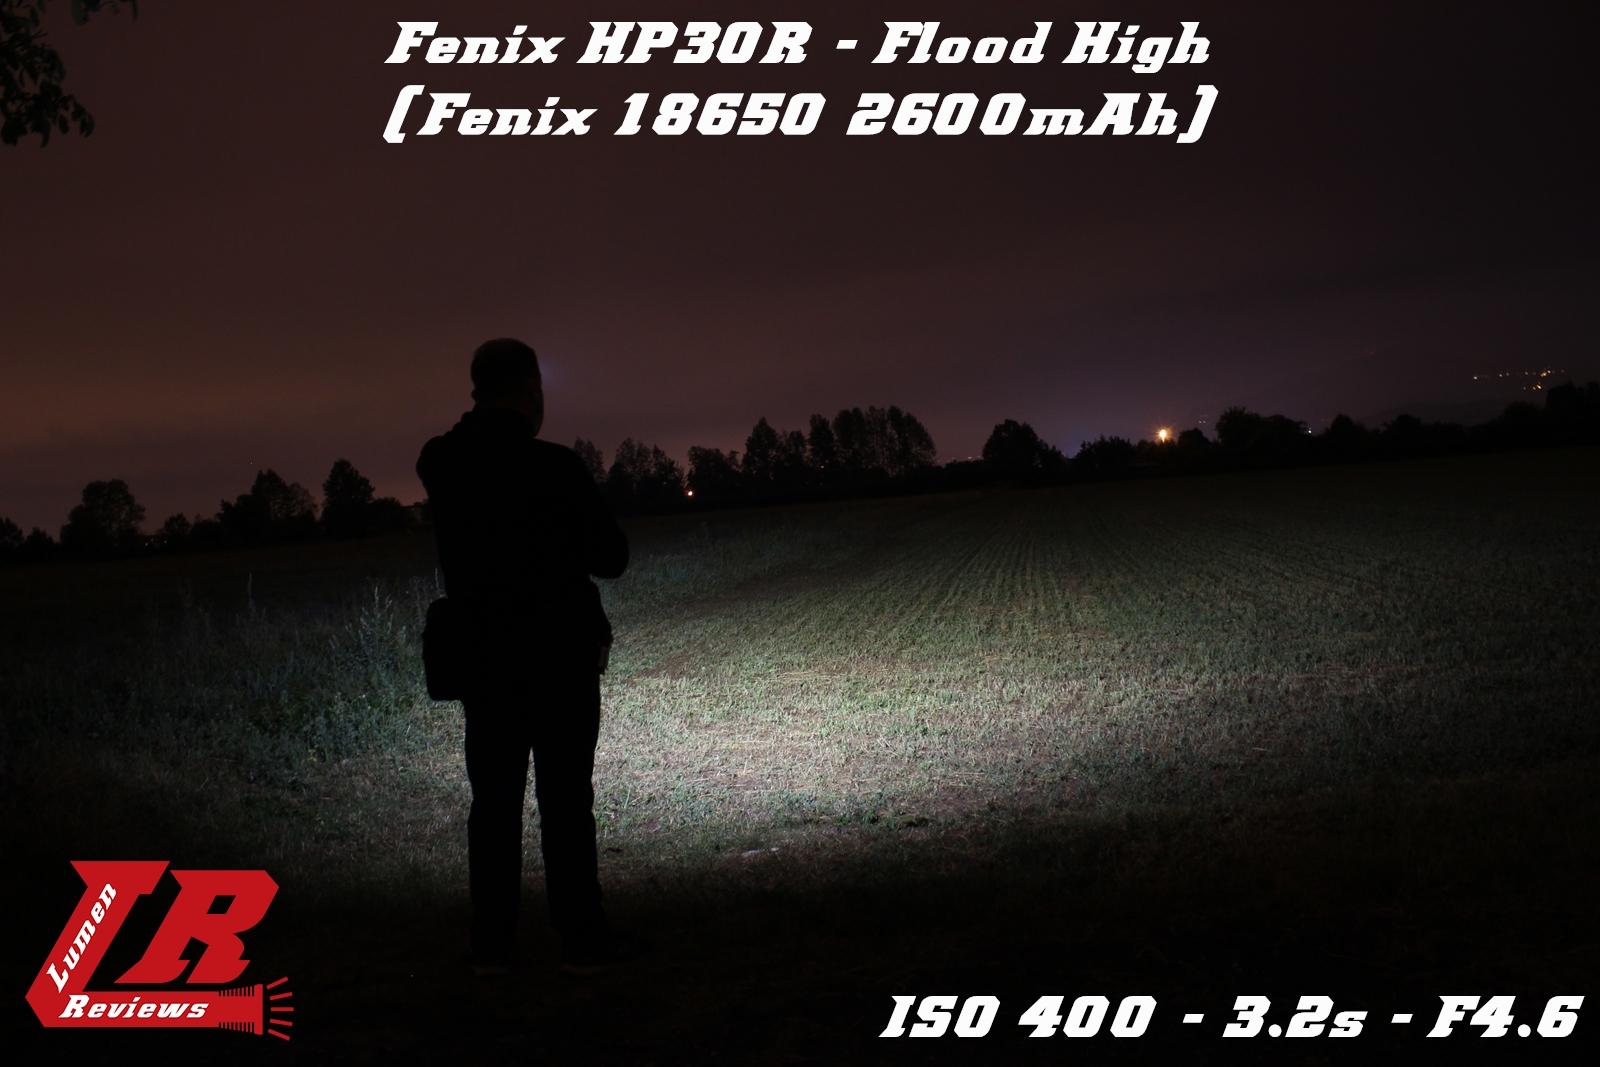 Fenix HP30R 22